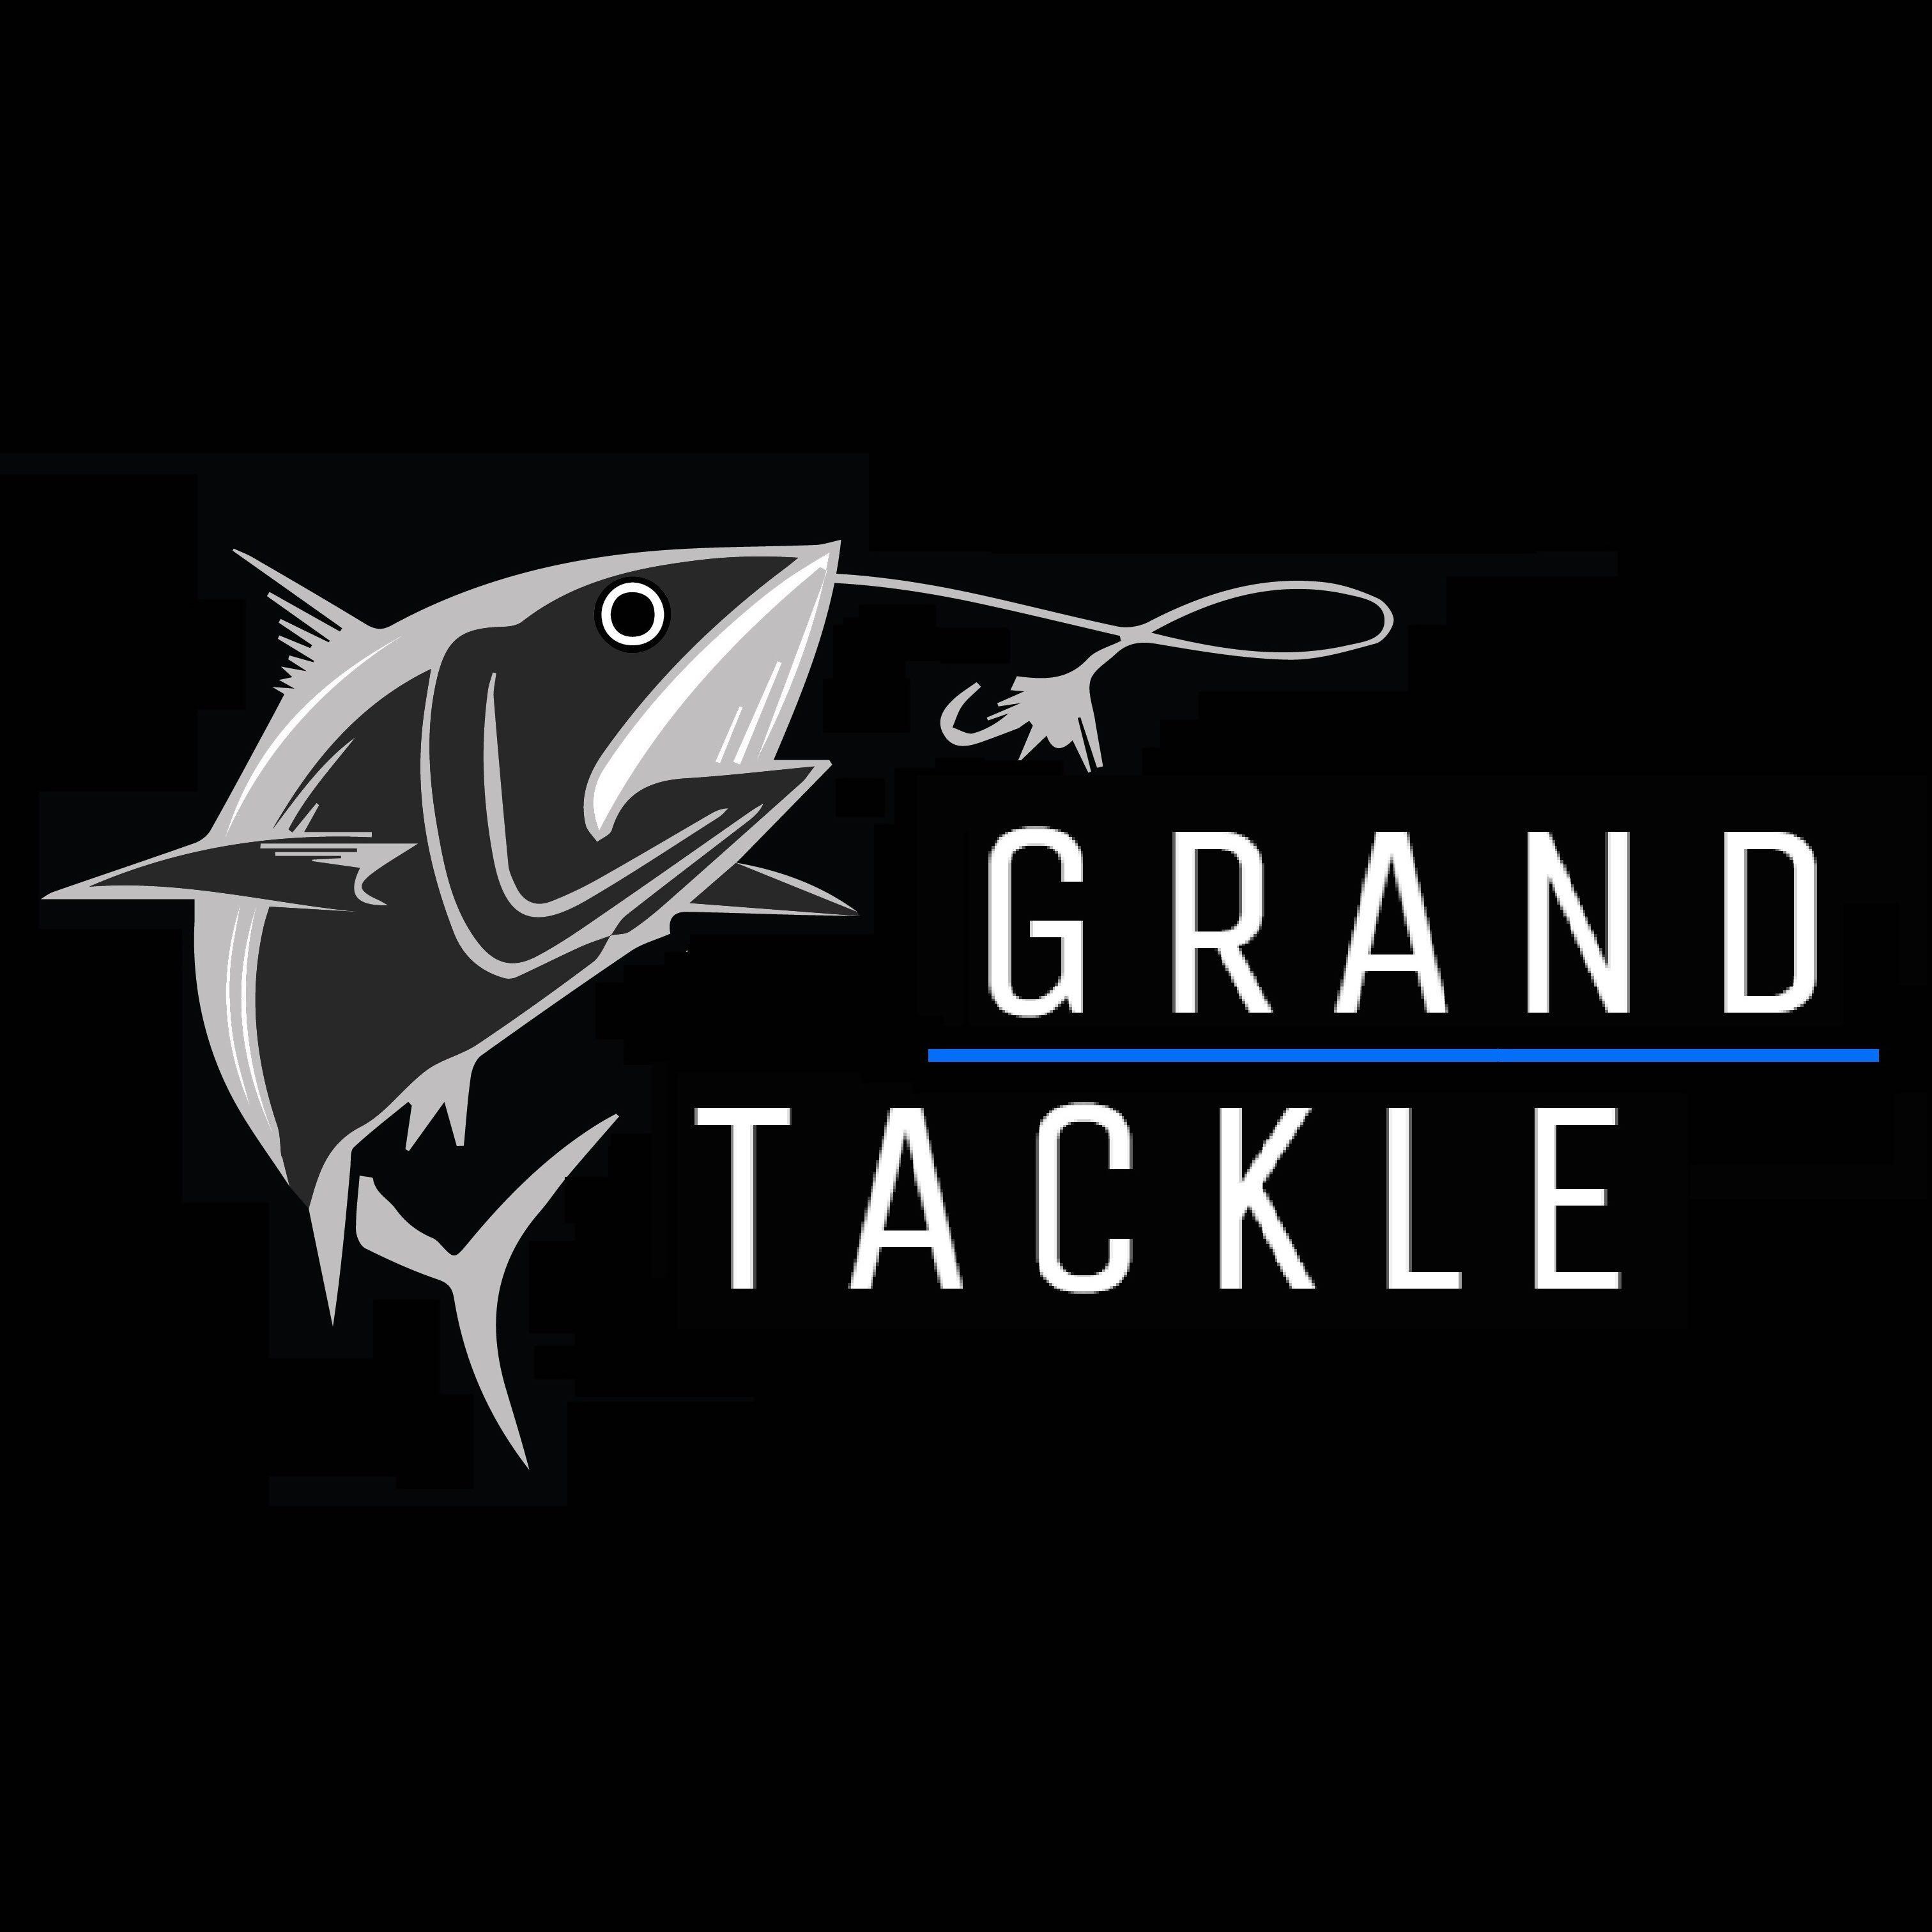 grand_tackle